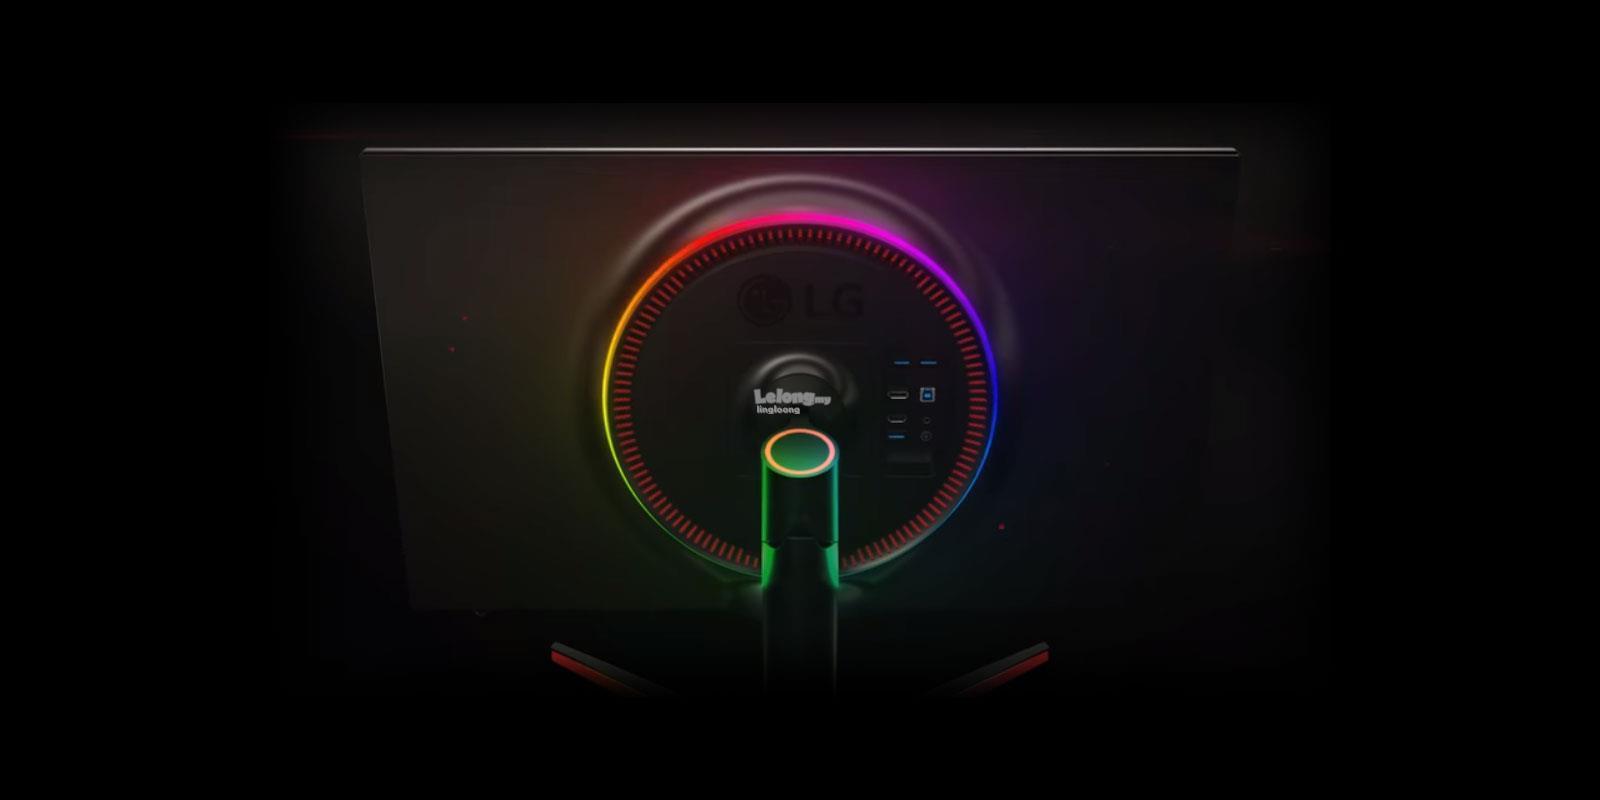 # LG 32GK850G 32' QHD Gaming Monitor # Sphere Lighting Effect